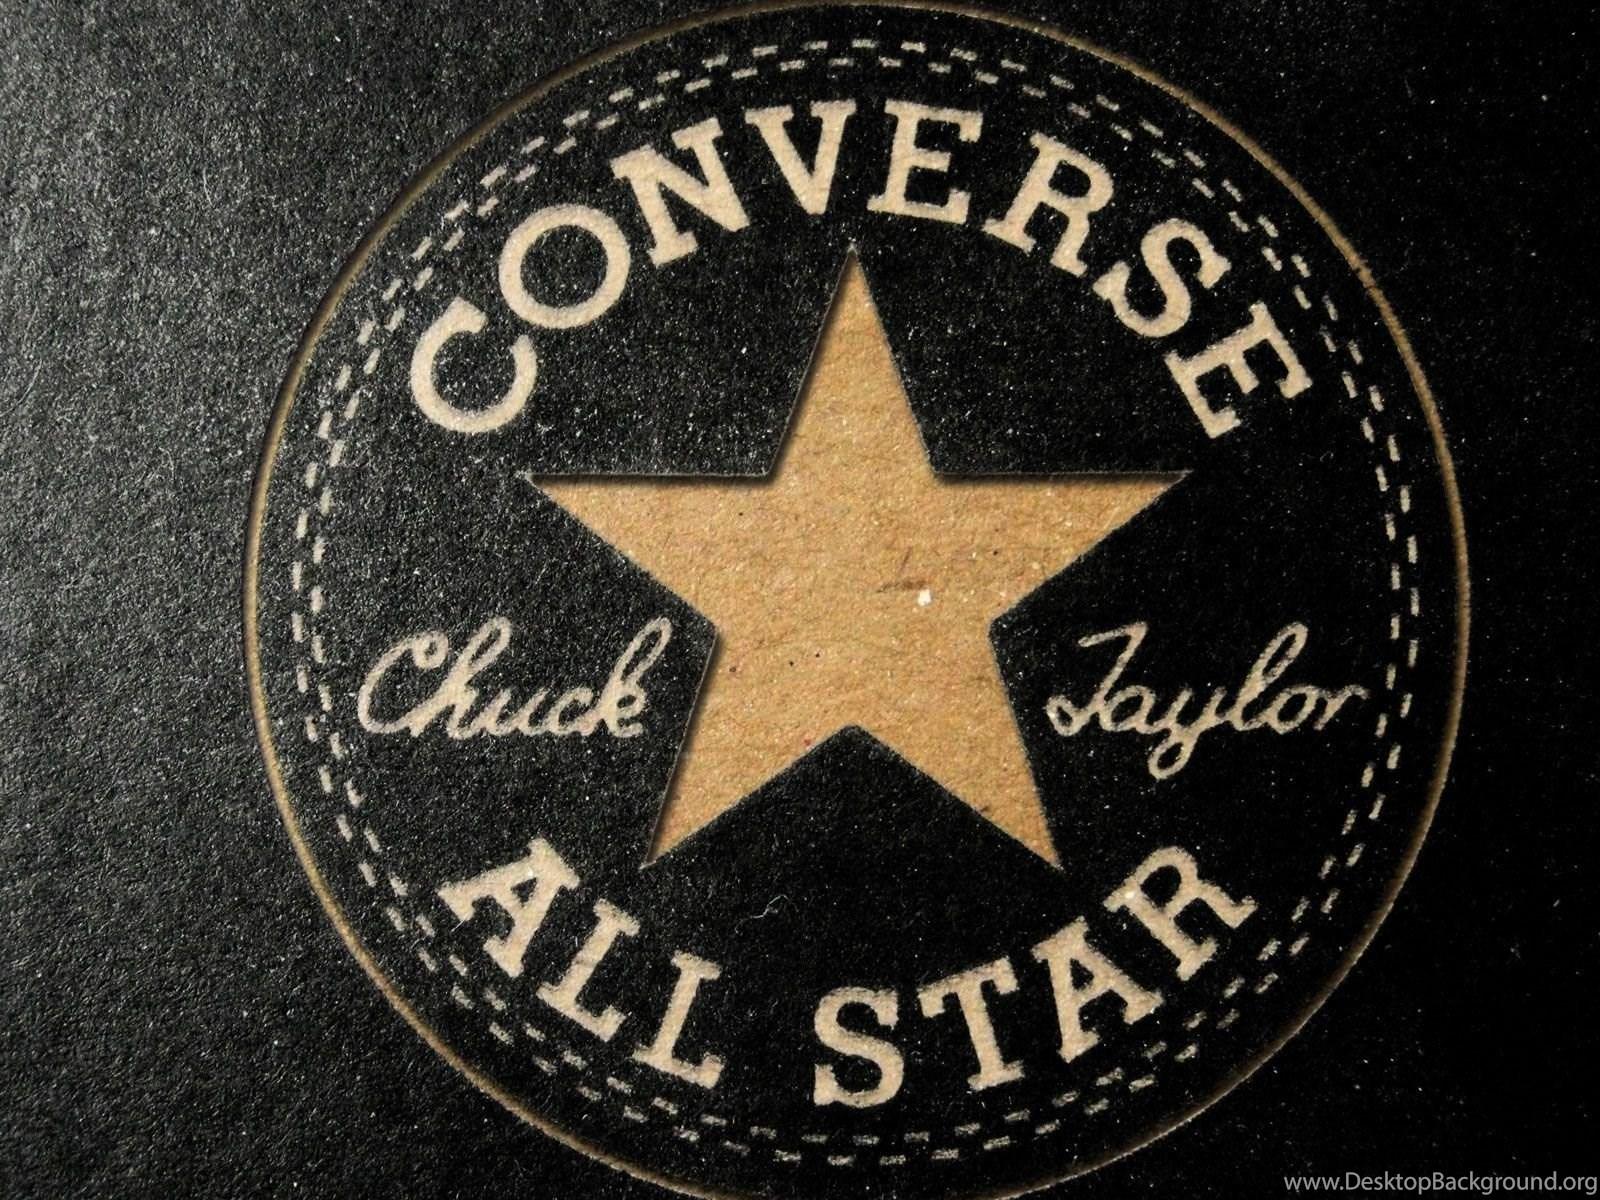 Unduh 880+ Wallpaper Converse Terbaik